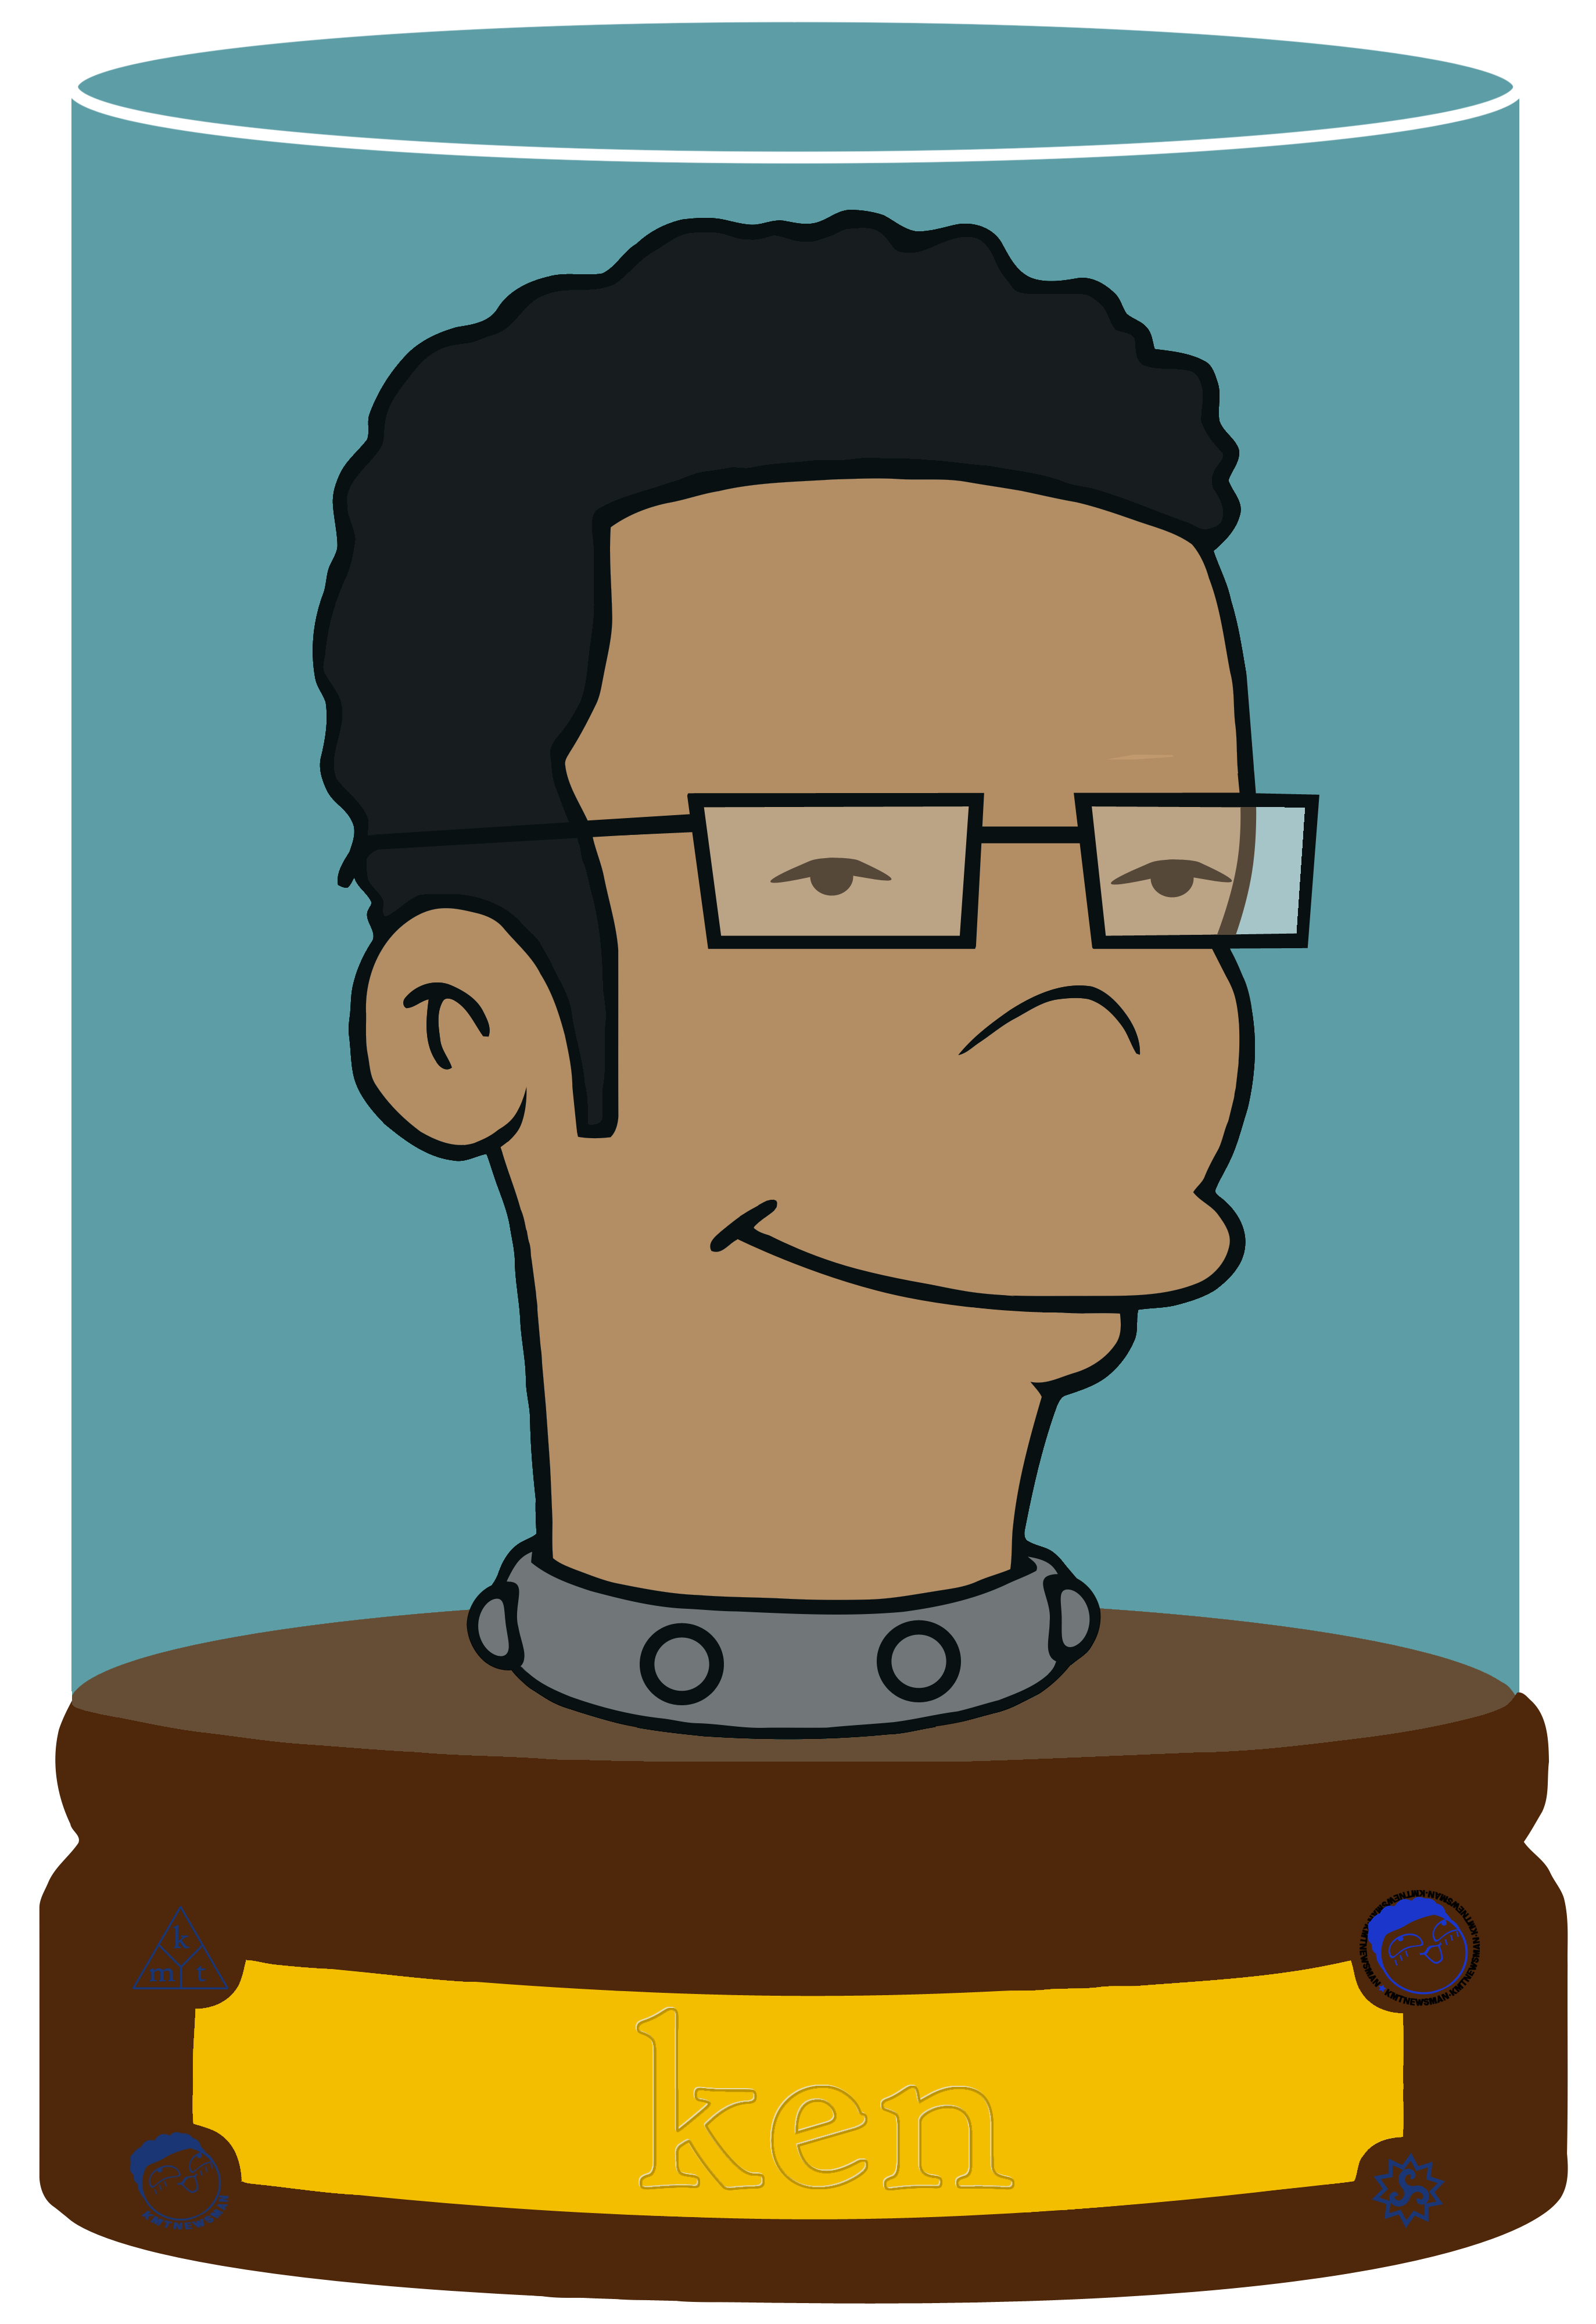 kmtnewsman's Profile Picture